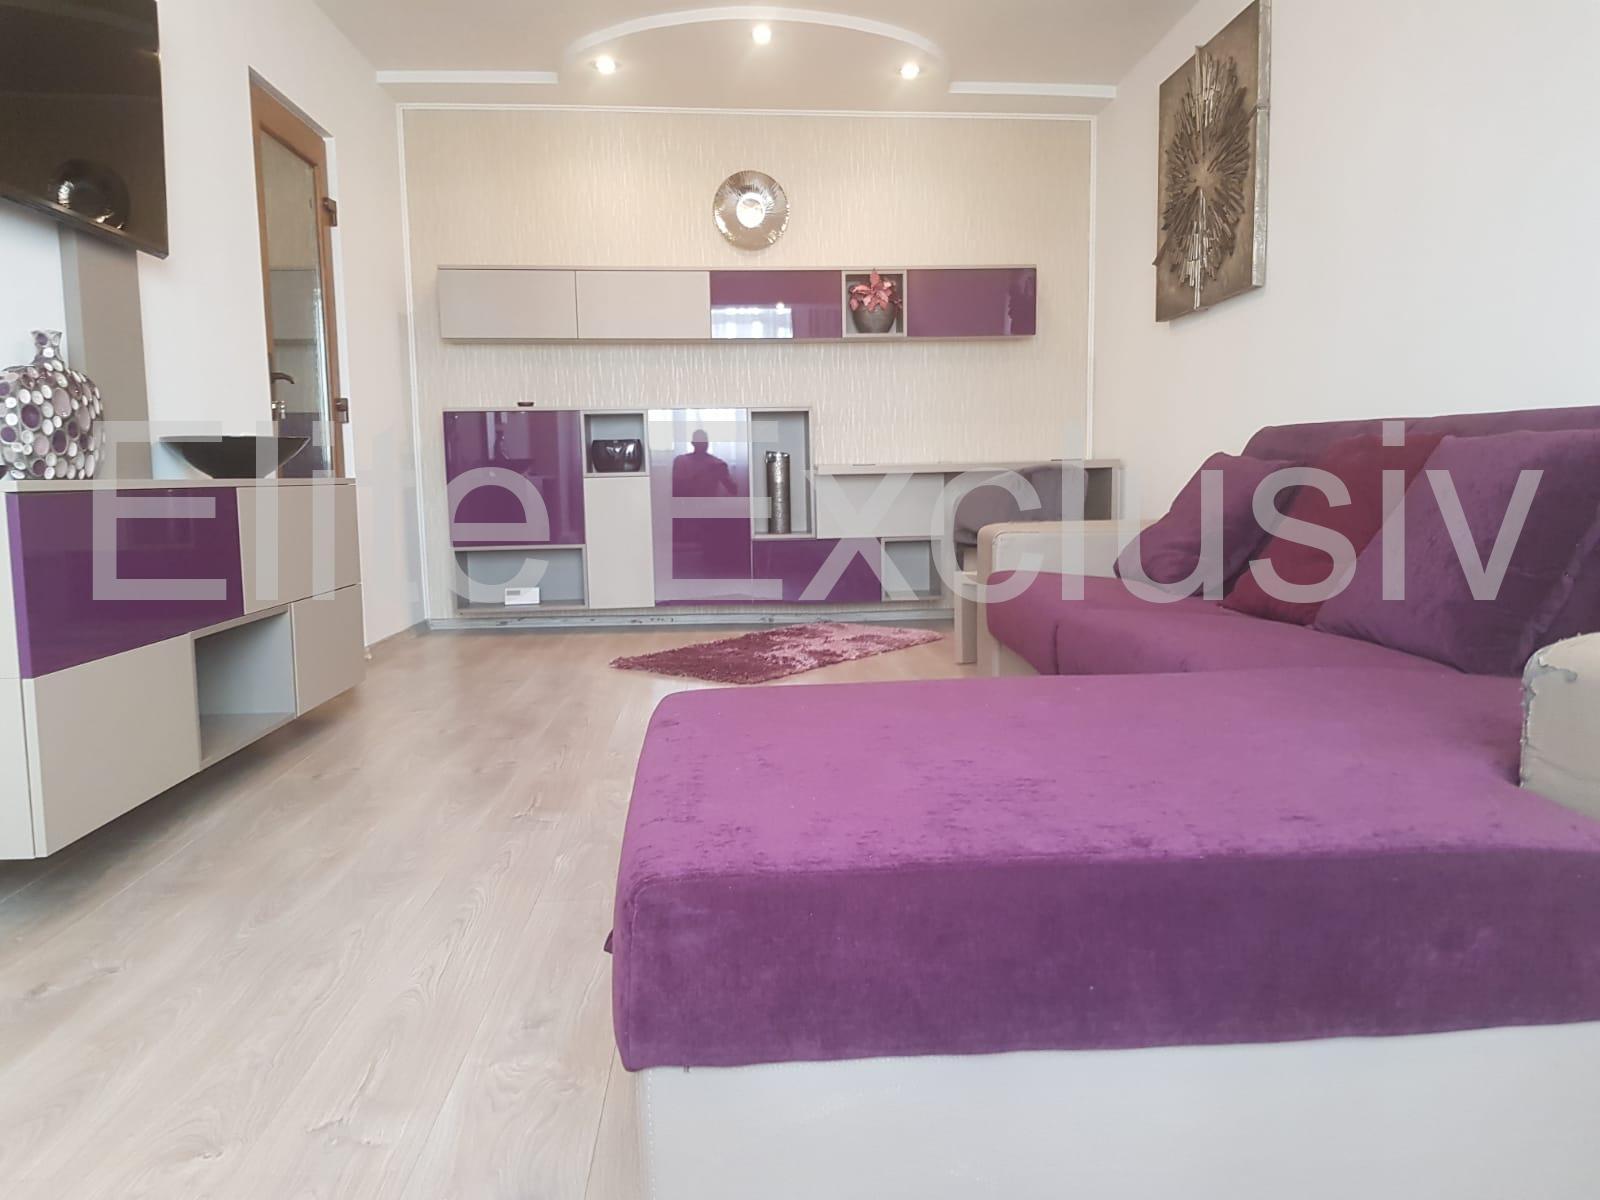 Dacia - Inchiriere apartament deosebit de 2 camere